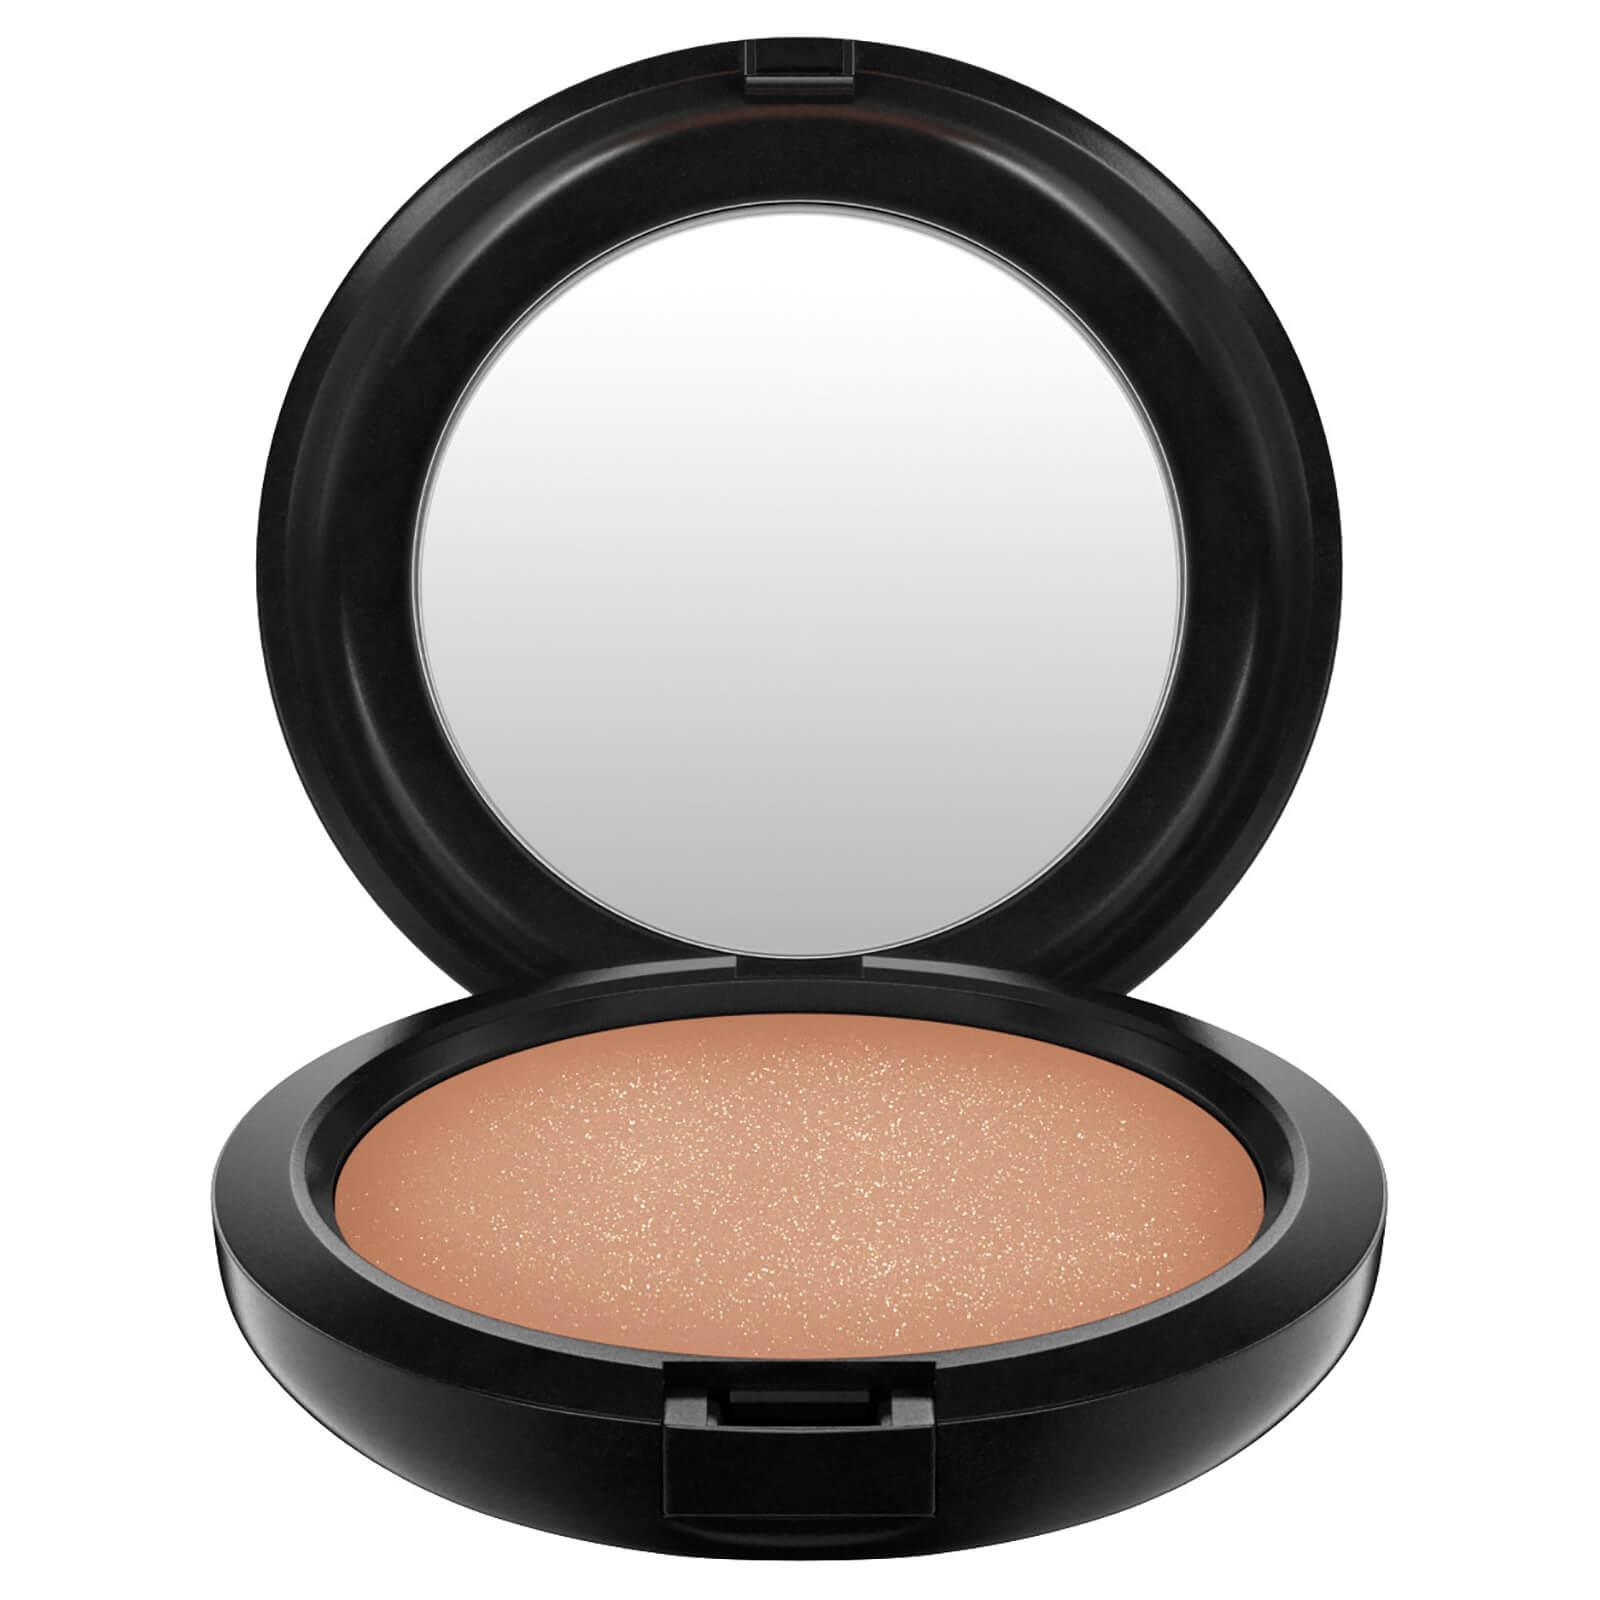 MAC Bronzing Powder (Various Shades) - Refined Golden